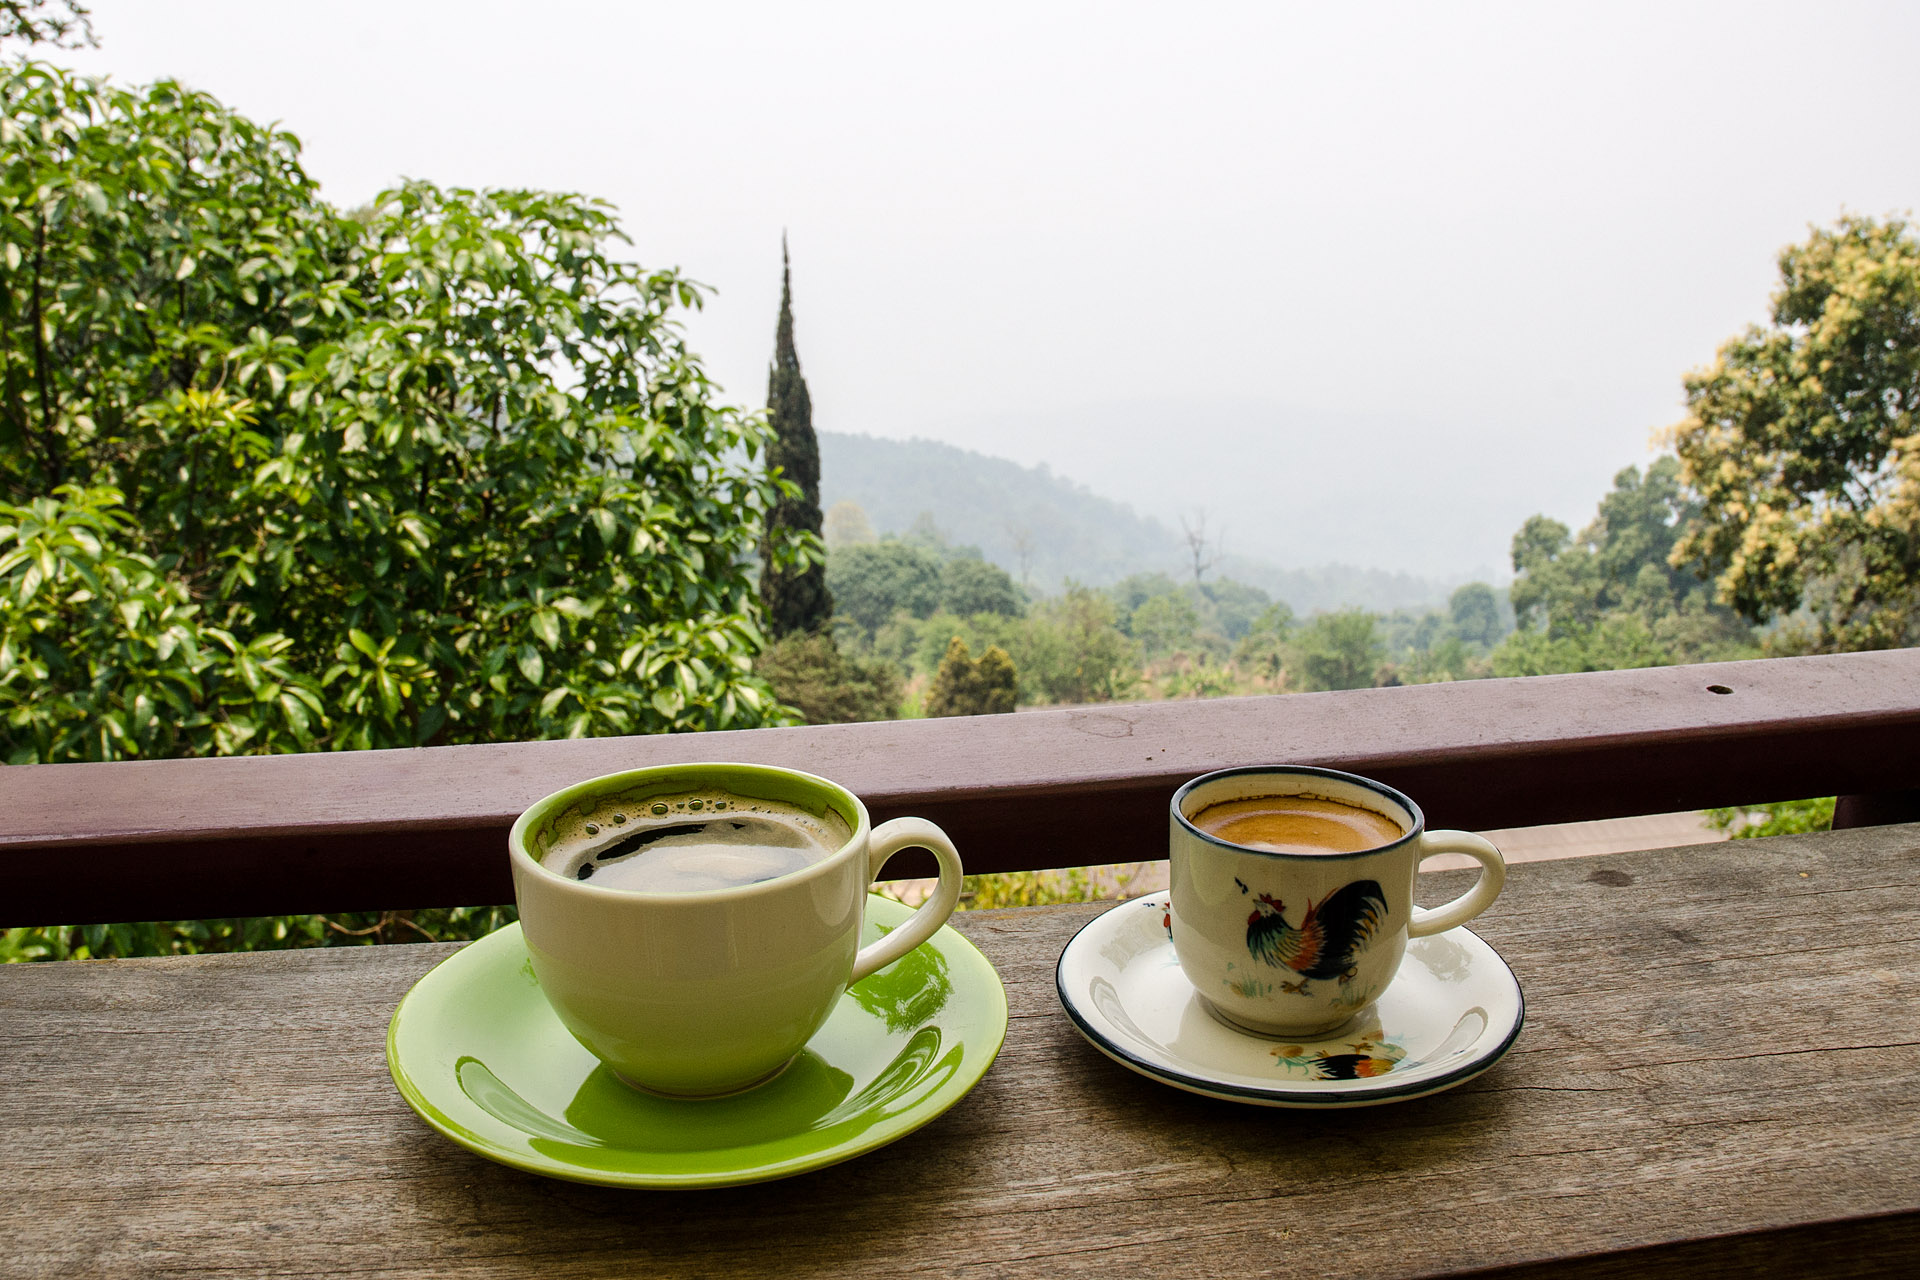 Hilltribe coffee